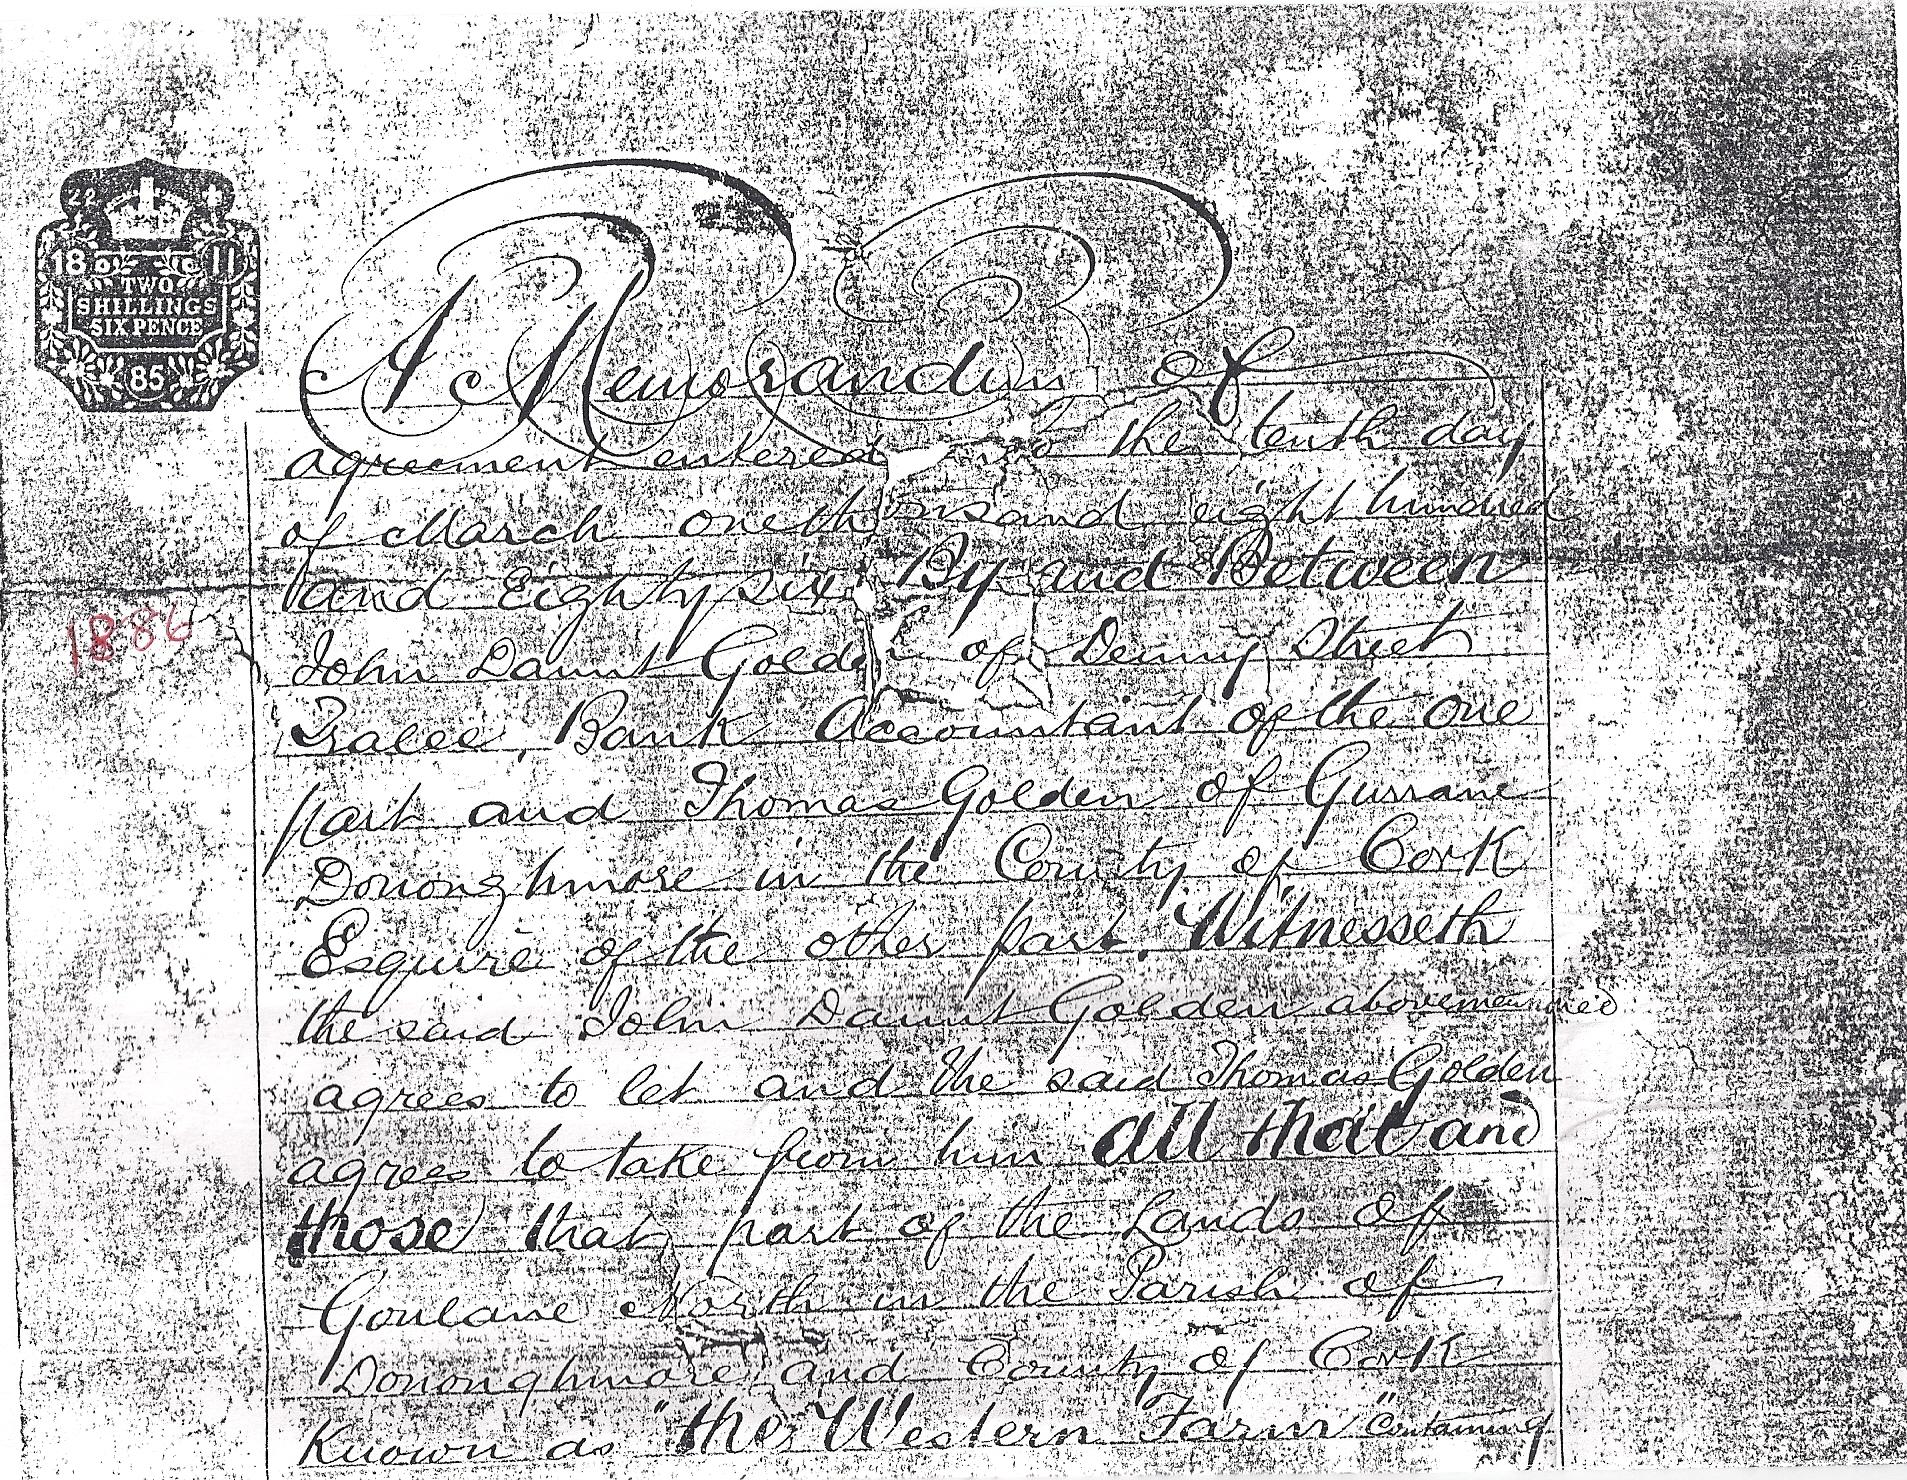 Western Farm agreement between John Daunt Golden and Thomas Golden 1.jpg